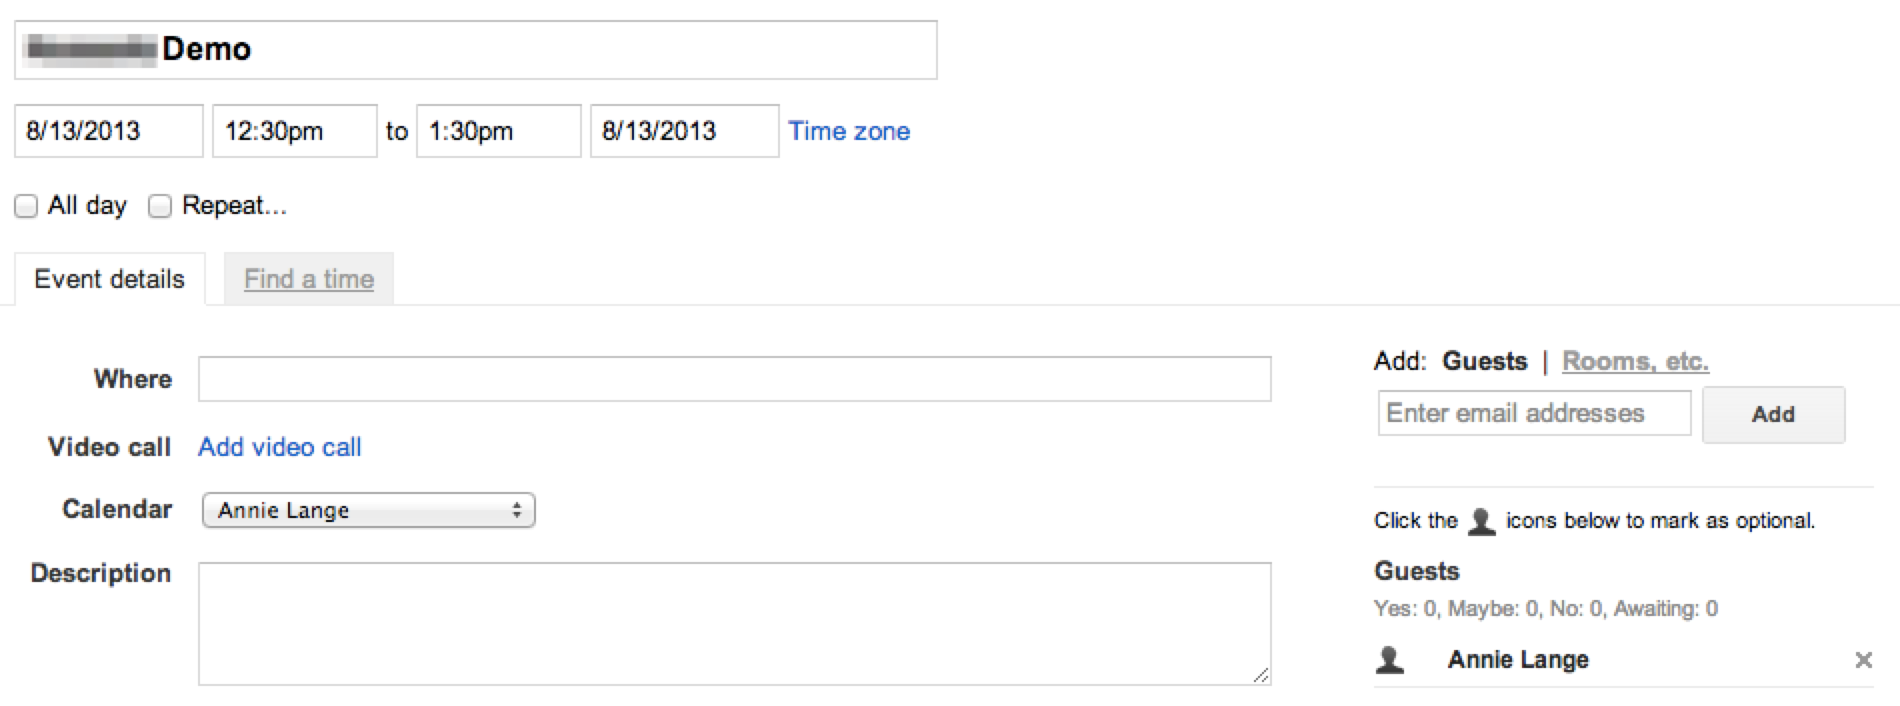 event1 view google calendar stream events salesforceiq help,Google Calendar Event Invite